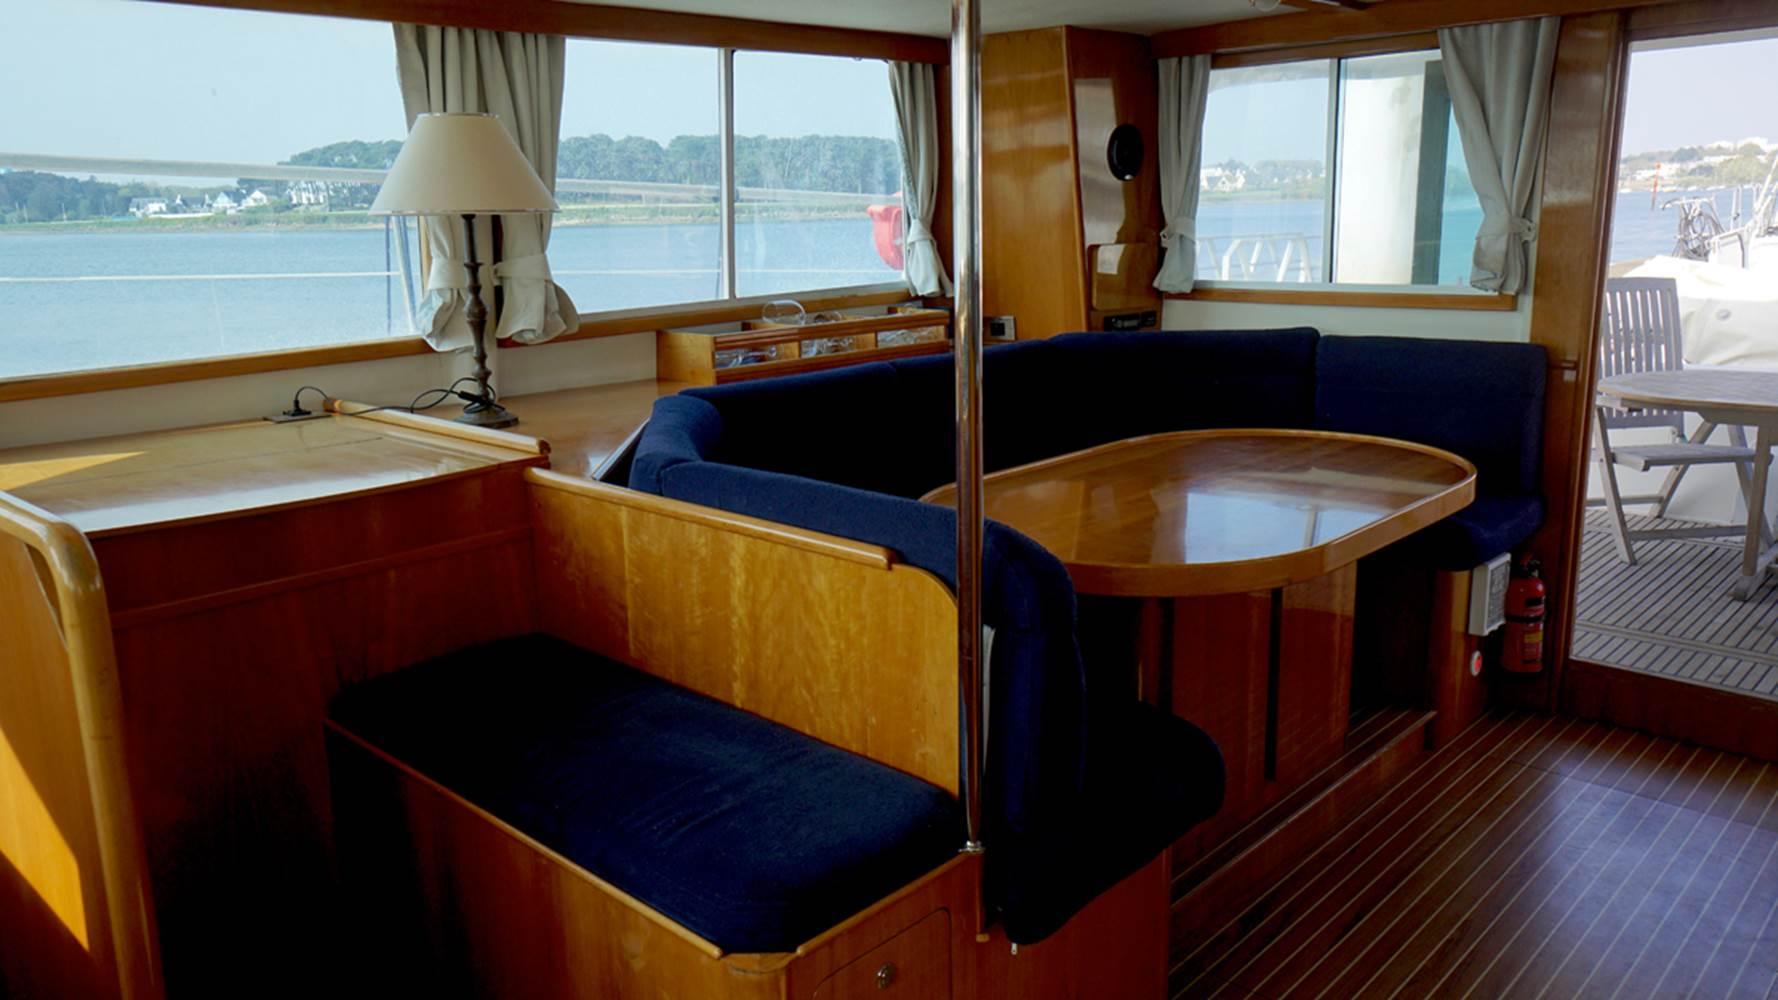 Carré du catamaran à moteur Transcat 48 avec skipper ©